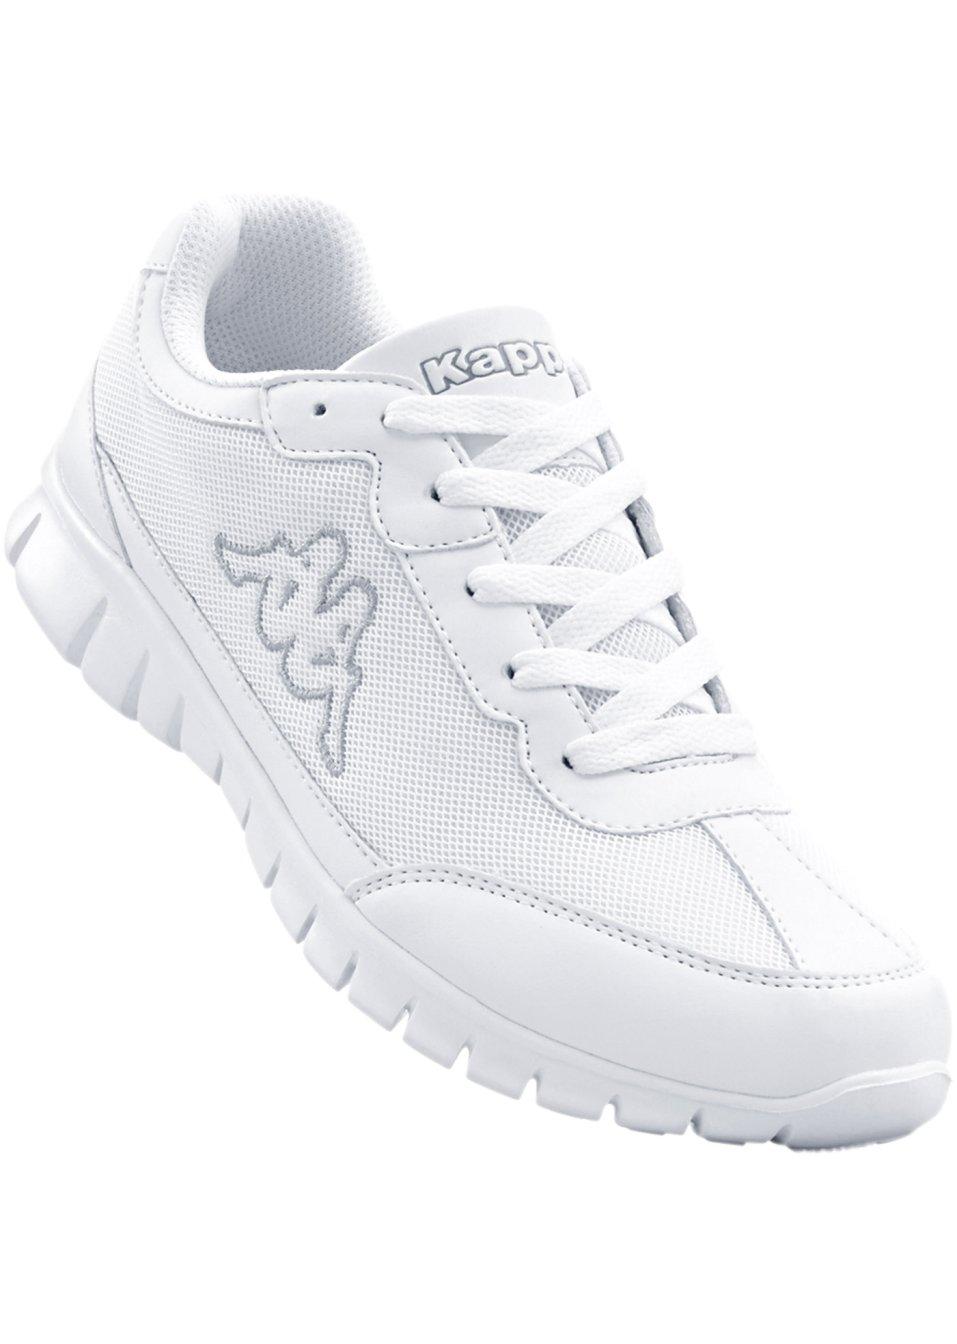 Sneakers de kappa blanc commande online - Bonprix suivi de commande ...